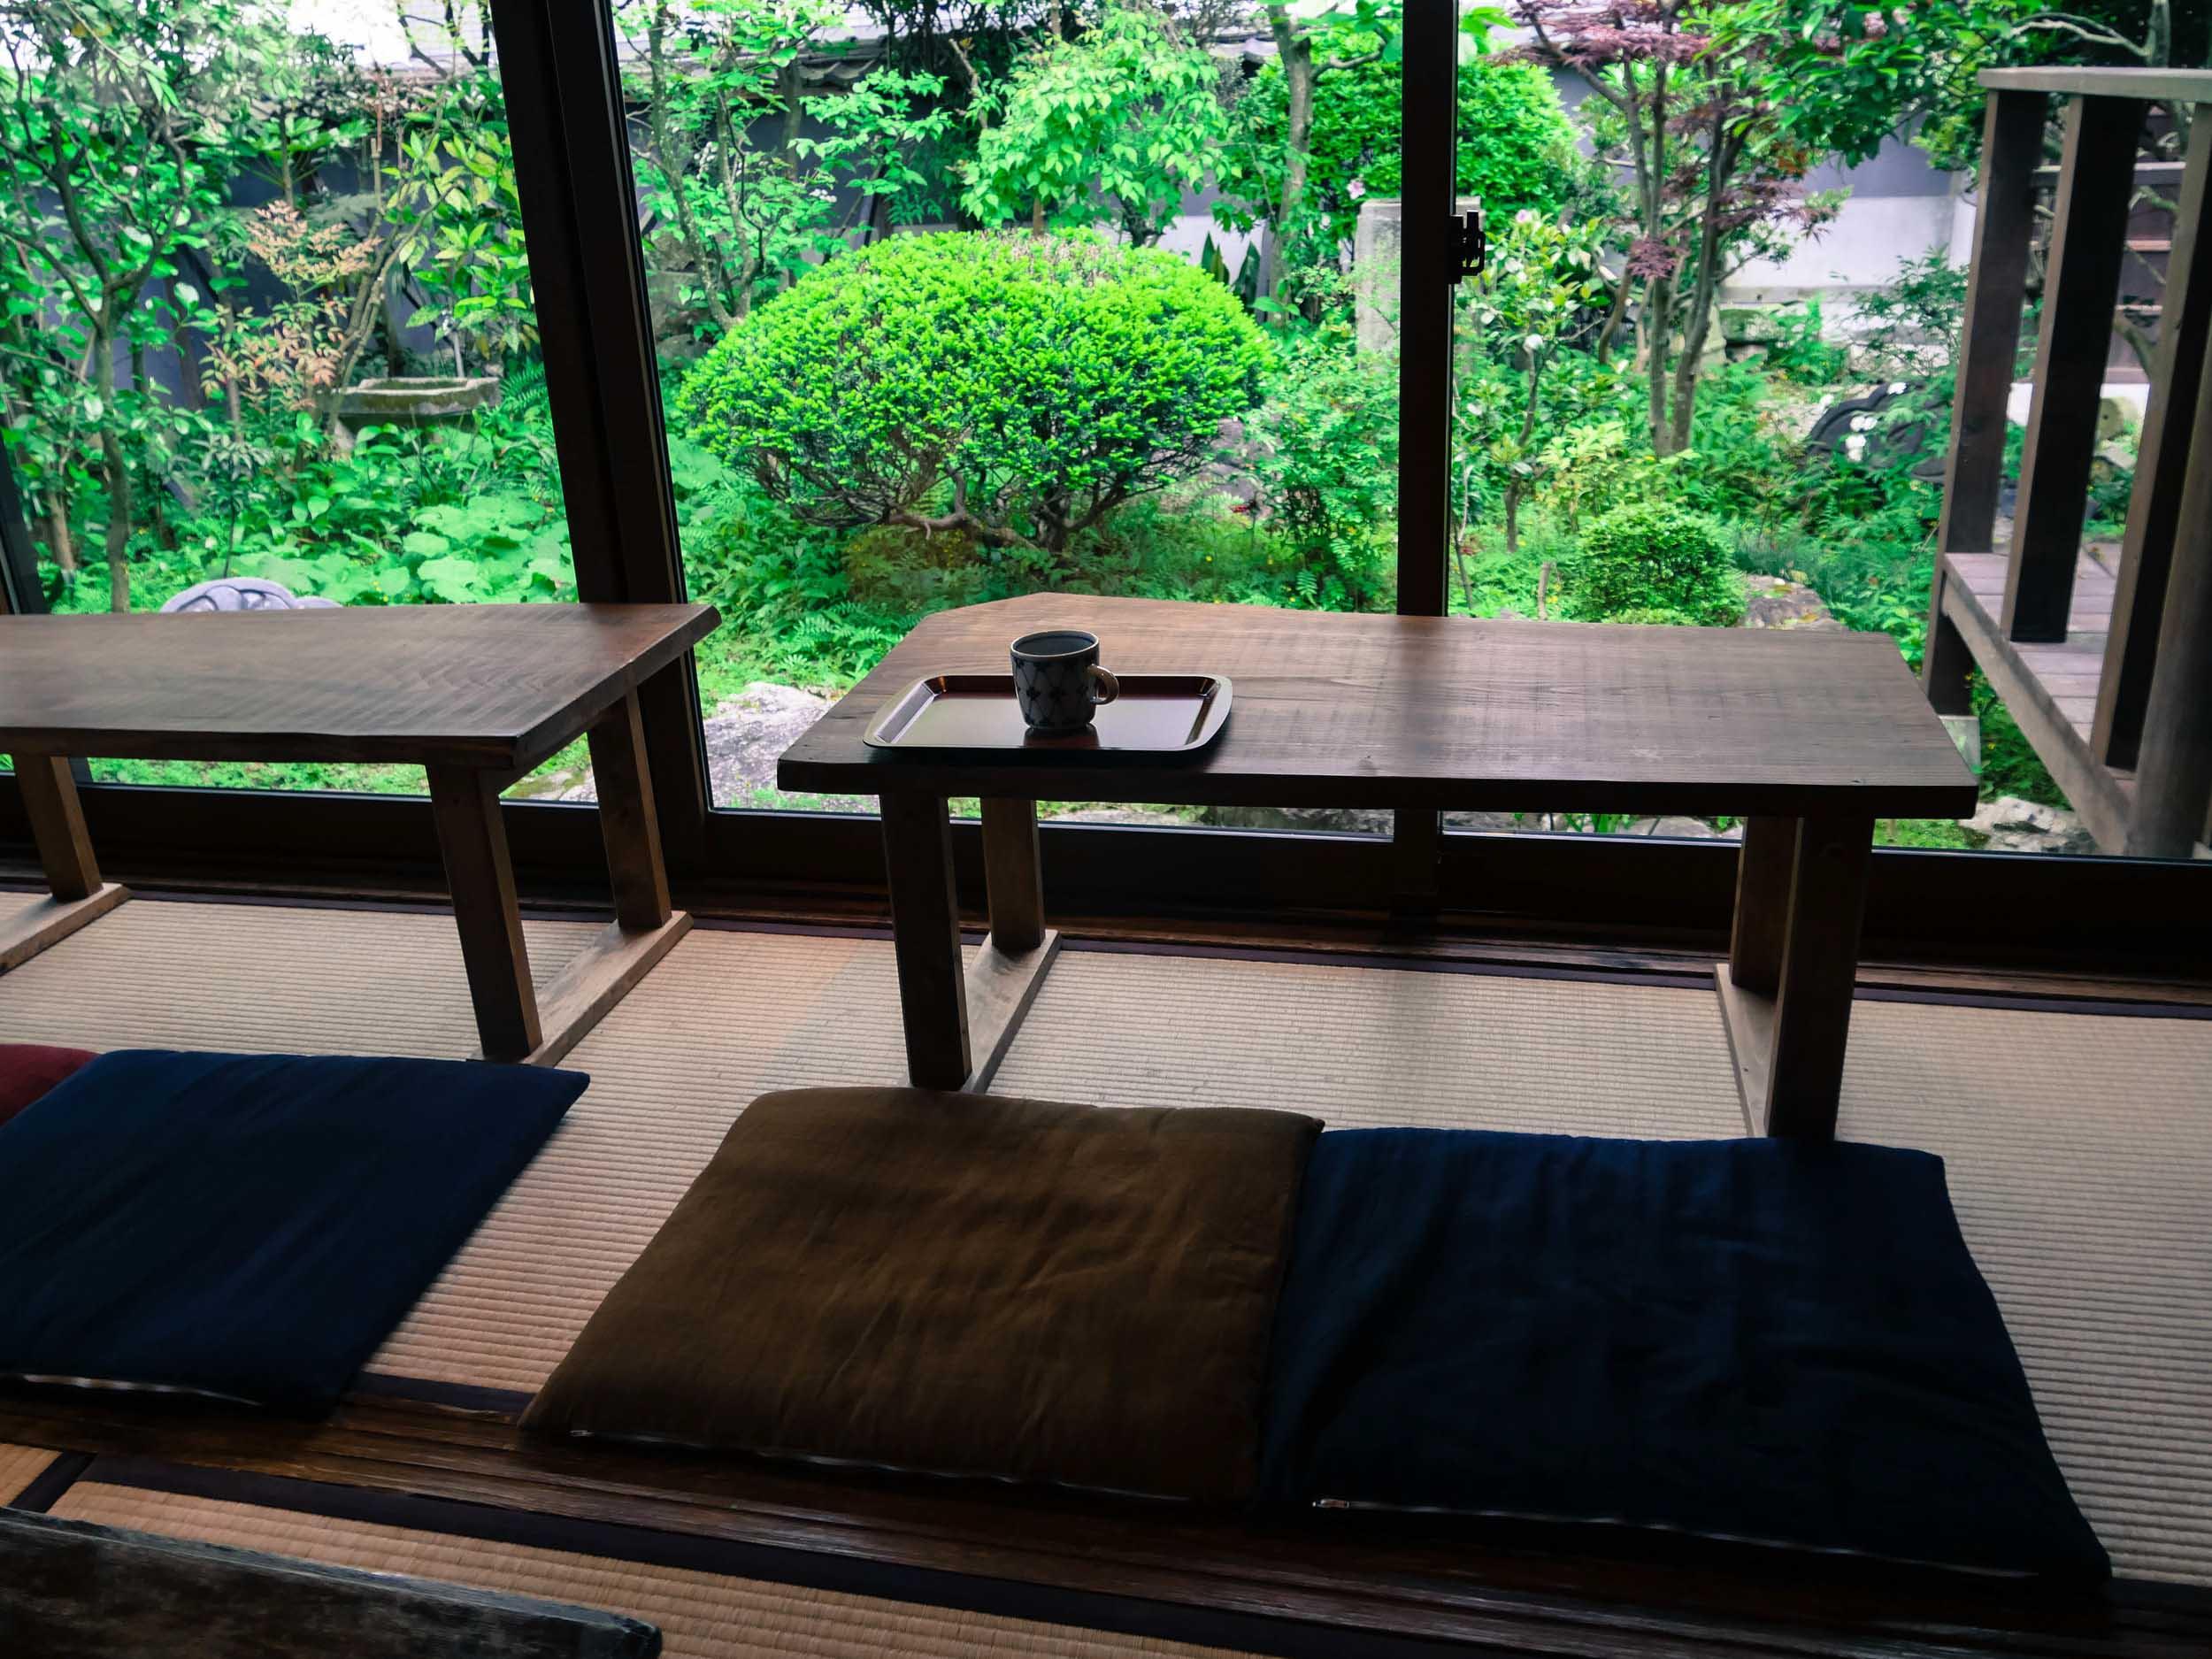 matsuyama-dougo-onsen-62.jpg